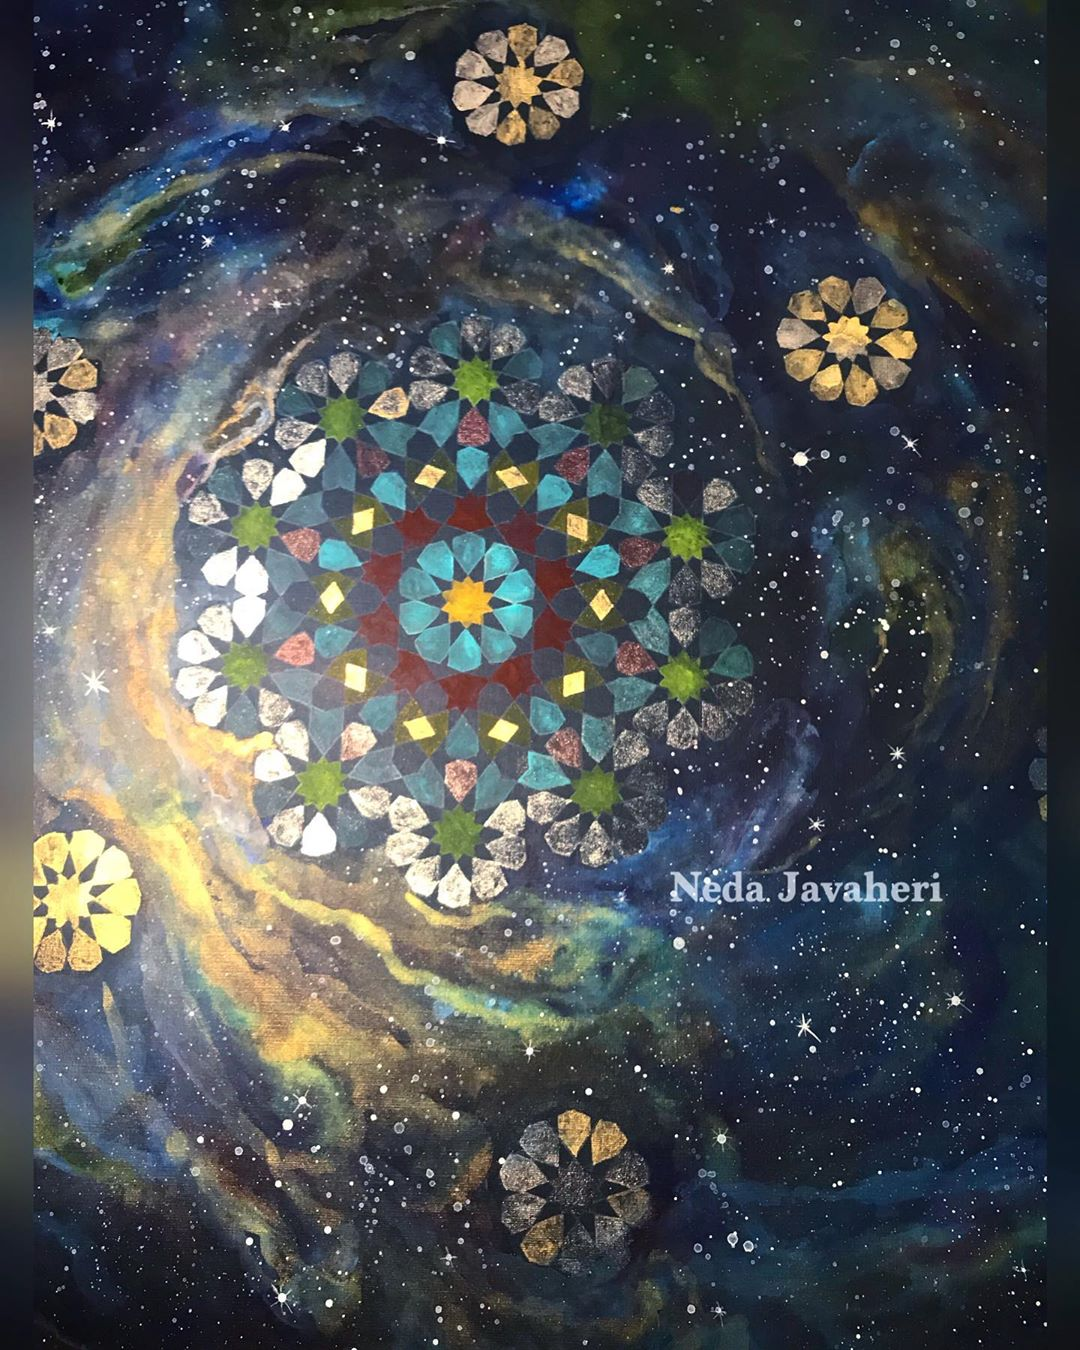 Karya Kaligrafi Galaxy… روز معلم امسال هم تمام شد.  ماراتون تقدیر و تشکرها بود و خاطره بازیها …- Ne Javaher